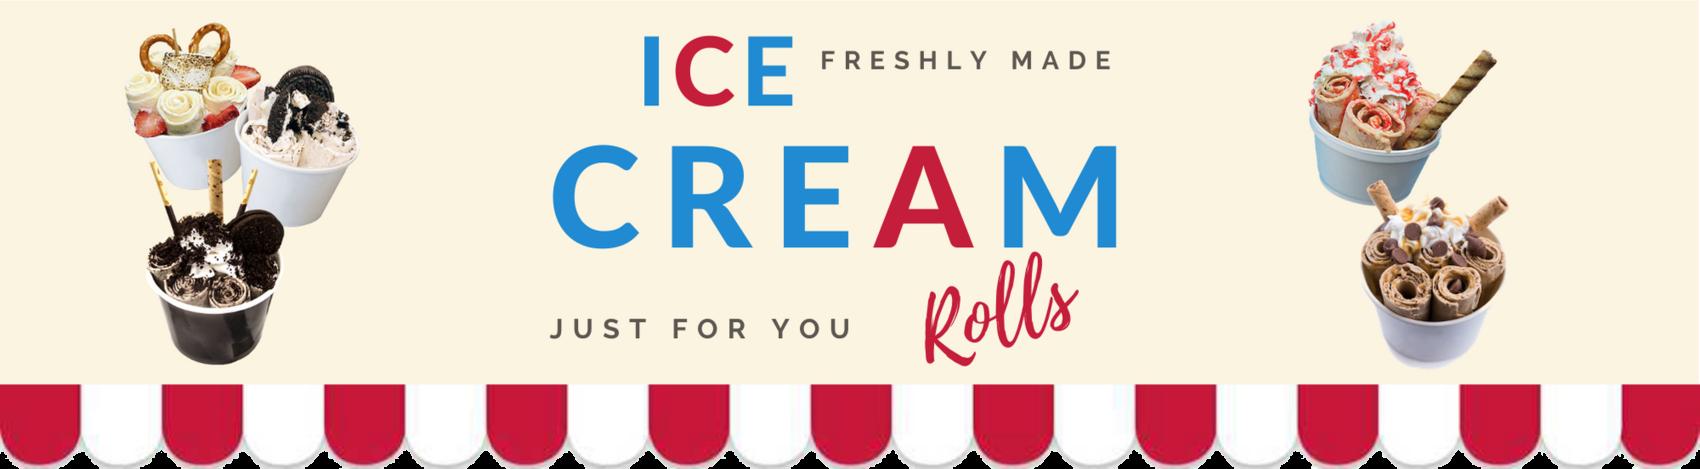 Ice-Cream Rolls